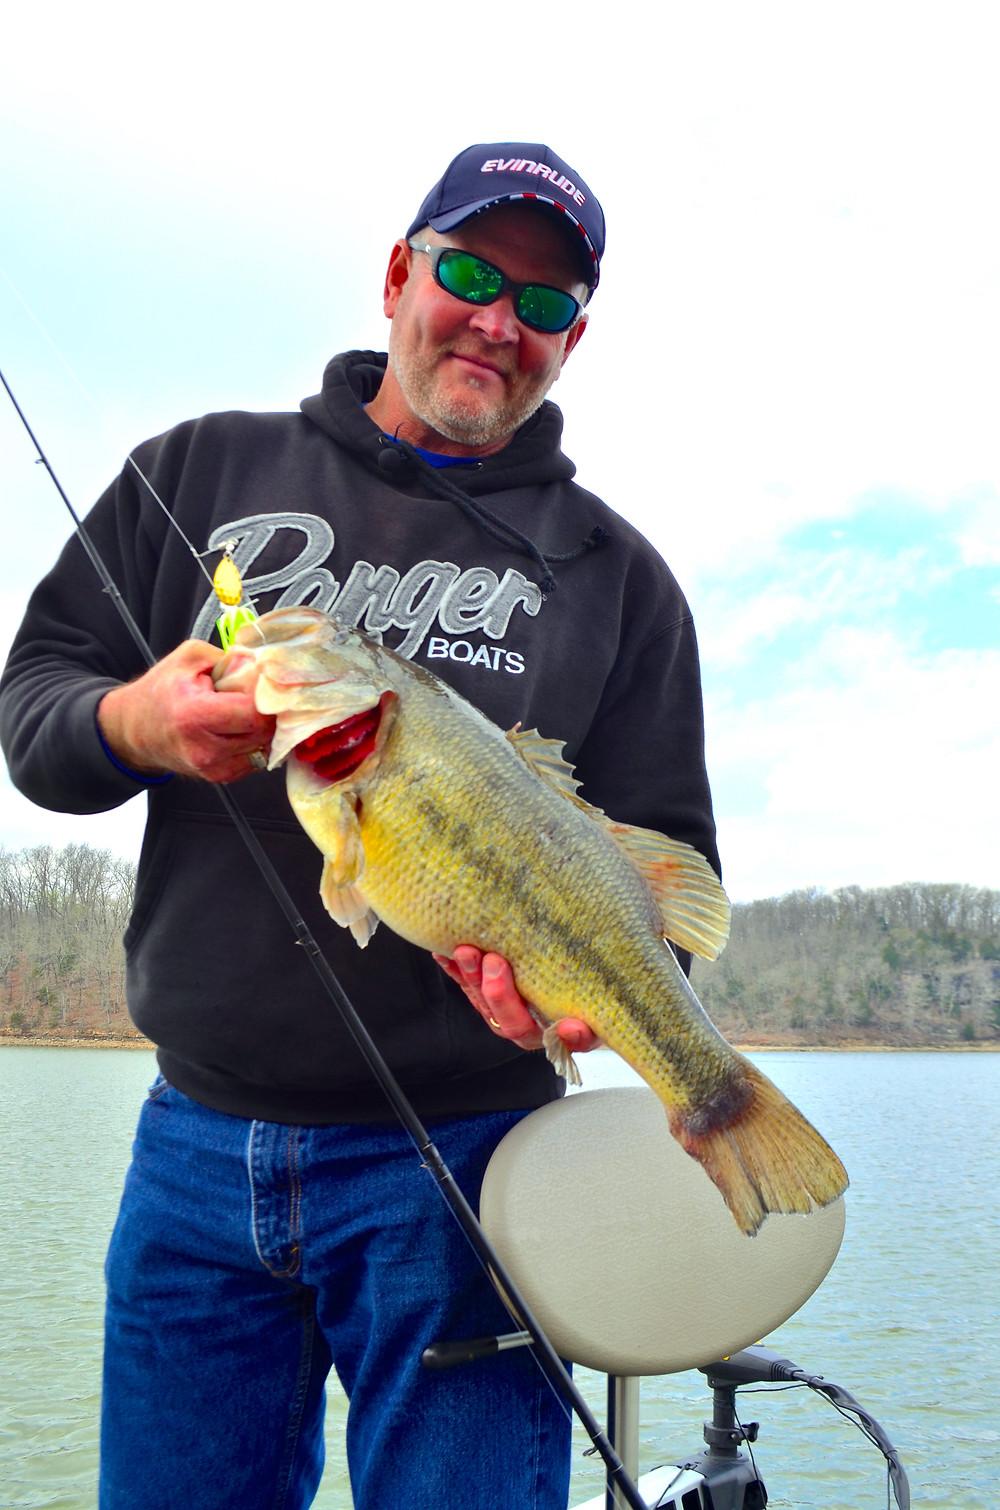 John Hewkins with Big Bass